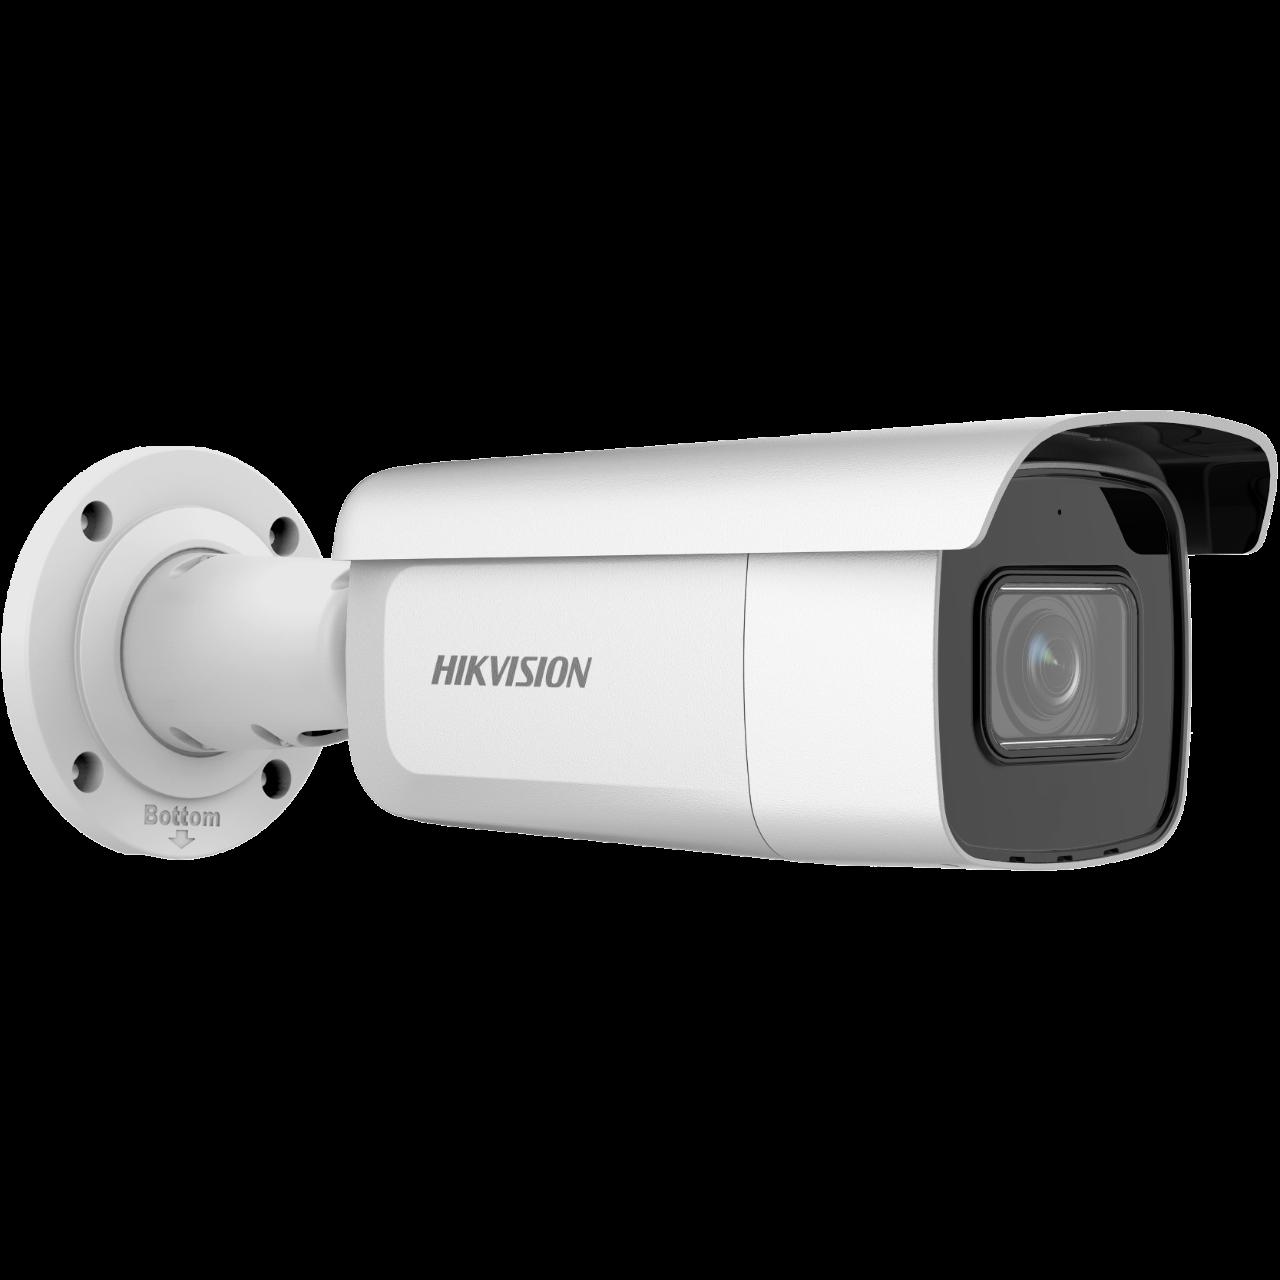 Picture of DS-2CD2623G2-IZS  2MP WDR Motorized Varifocal Bullet IP 2.8-12mm Camera Hikvision